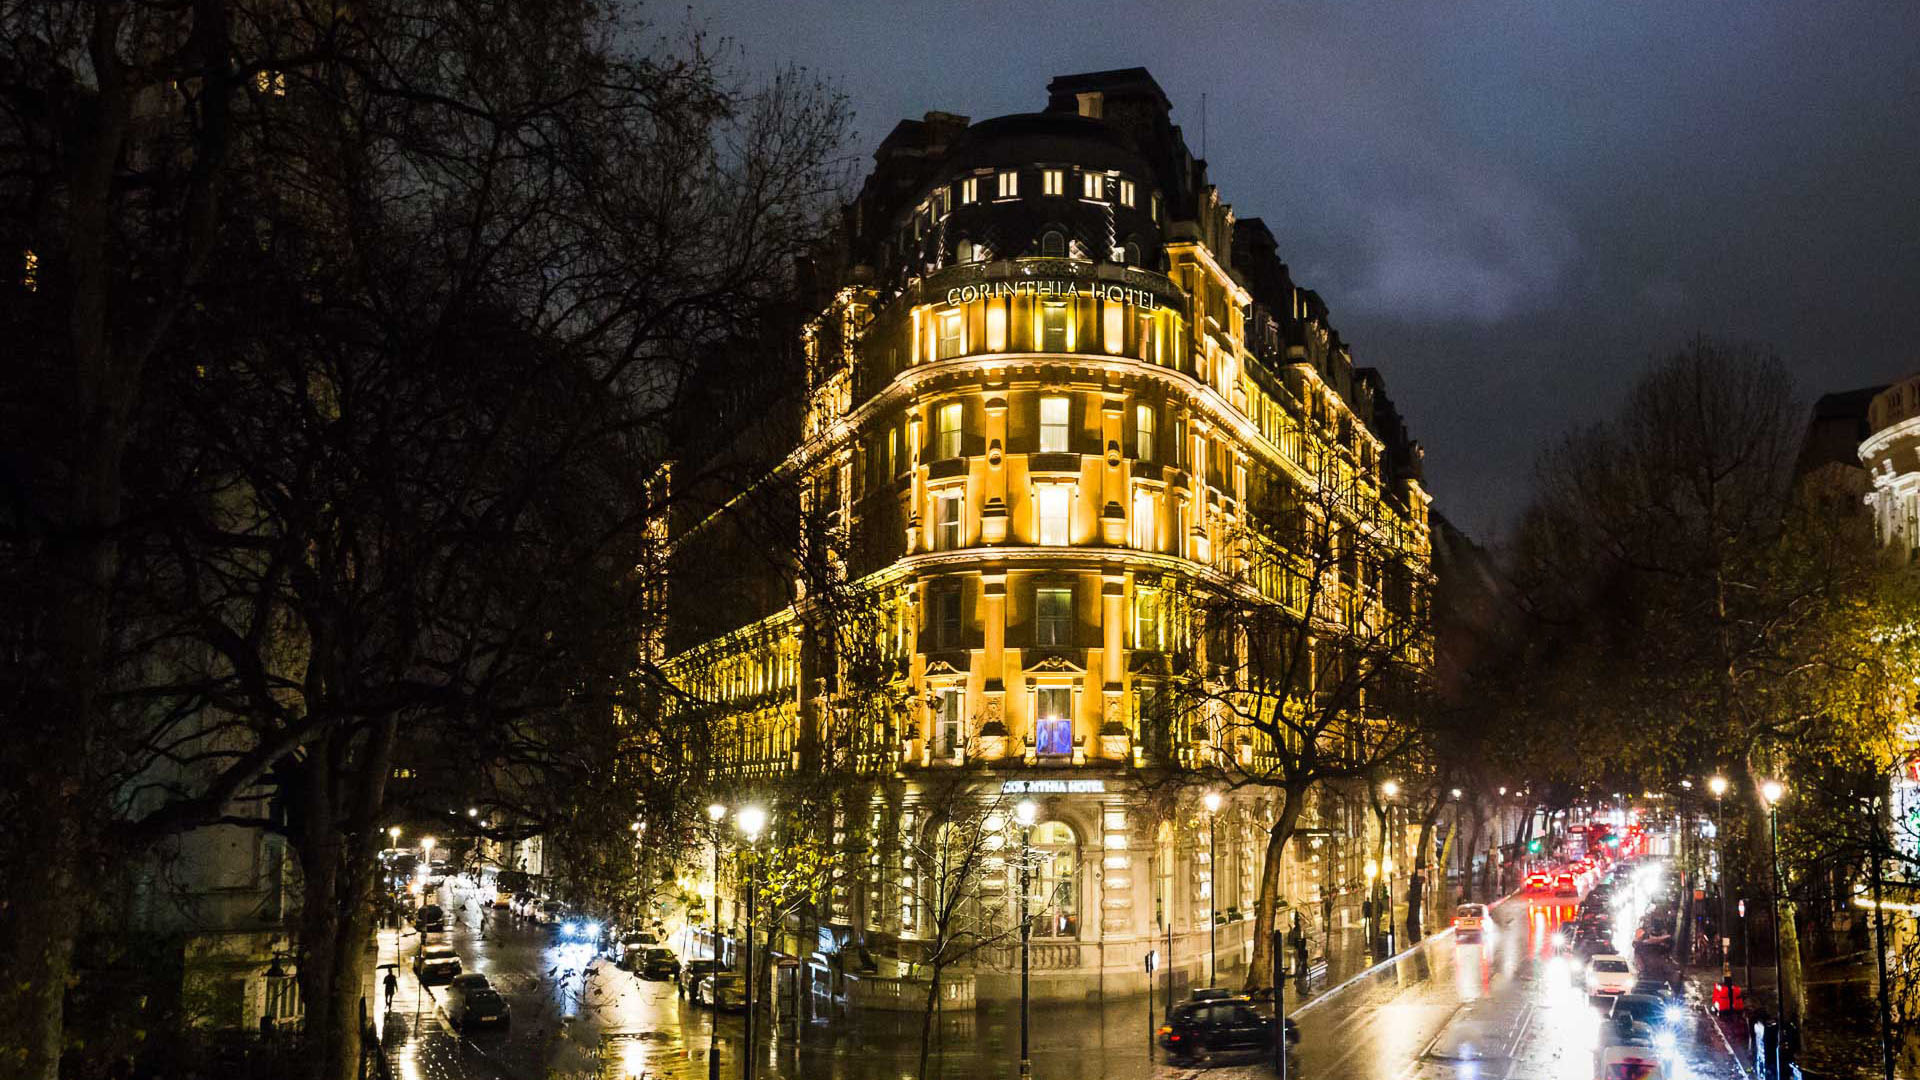 UK London Corinthia Hotel